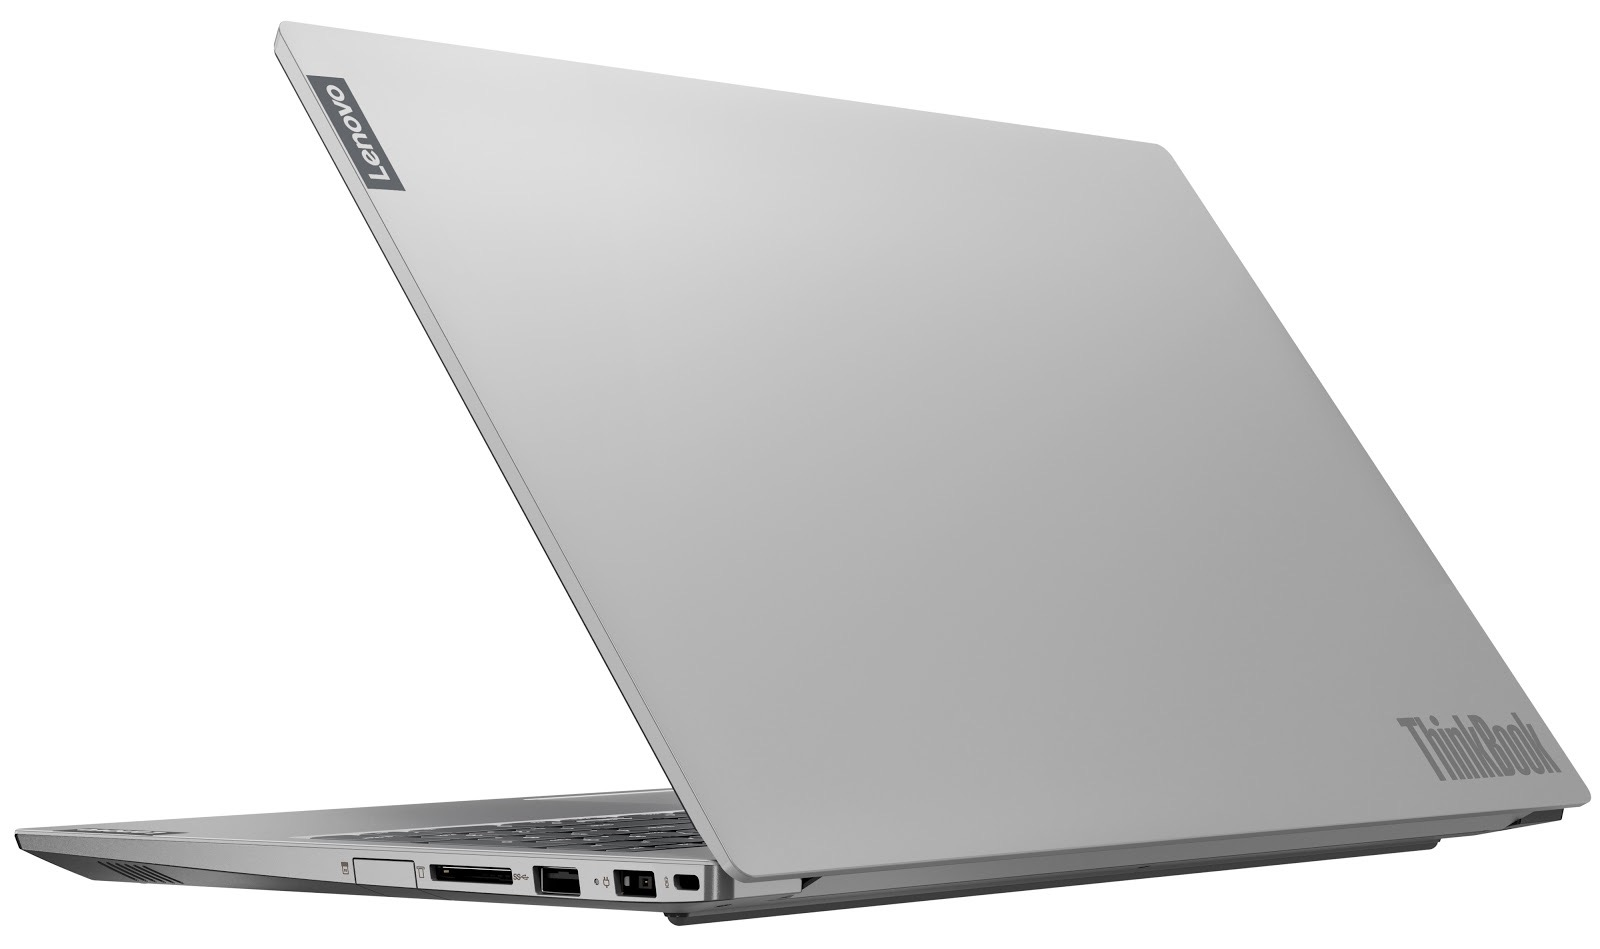 Фото 1. Ноутбук Lenovo ThinkBook 15-IIL (20SM003XRU)